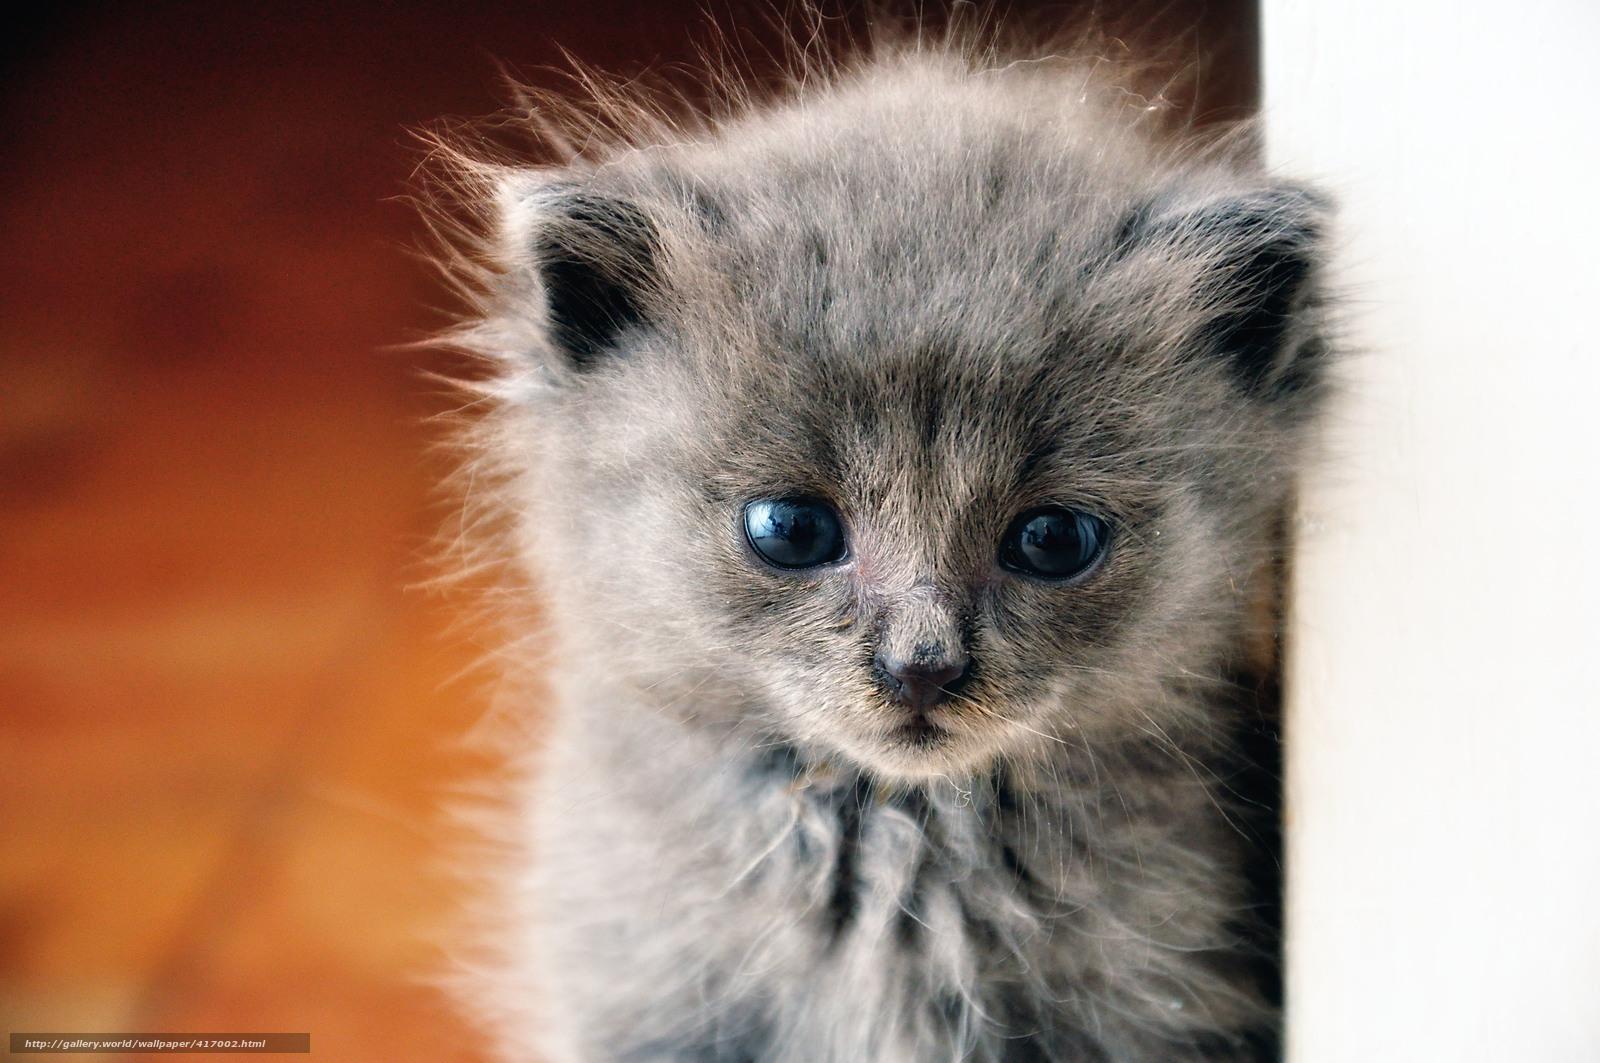 Download wallpaper kitten fluffy gray blue eyed free desktop